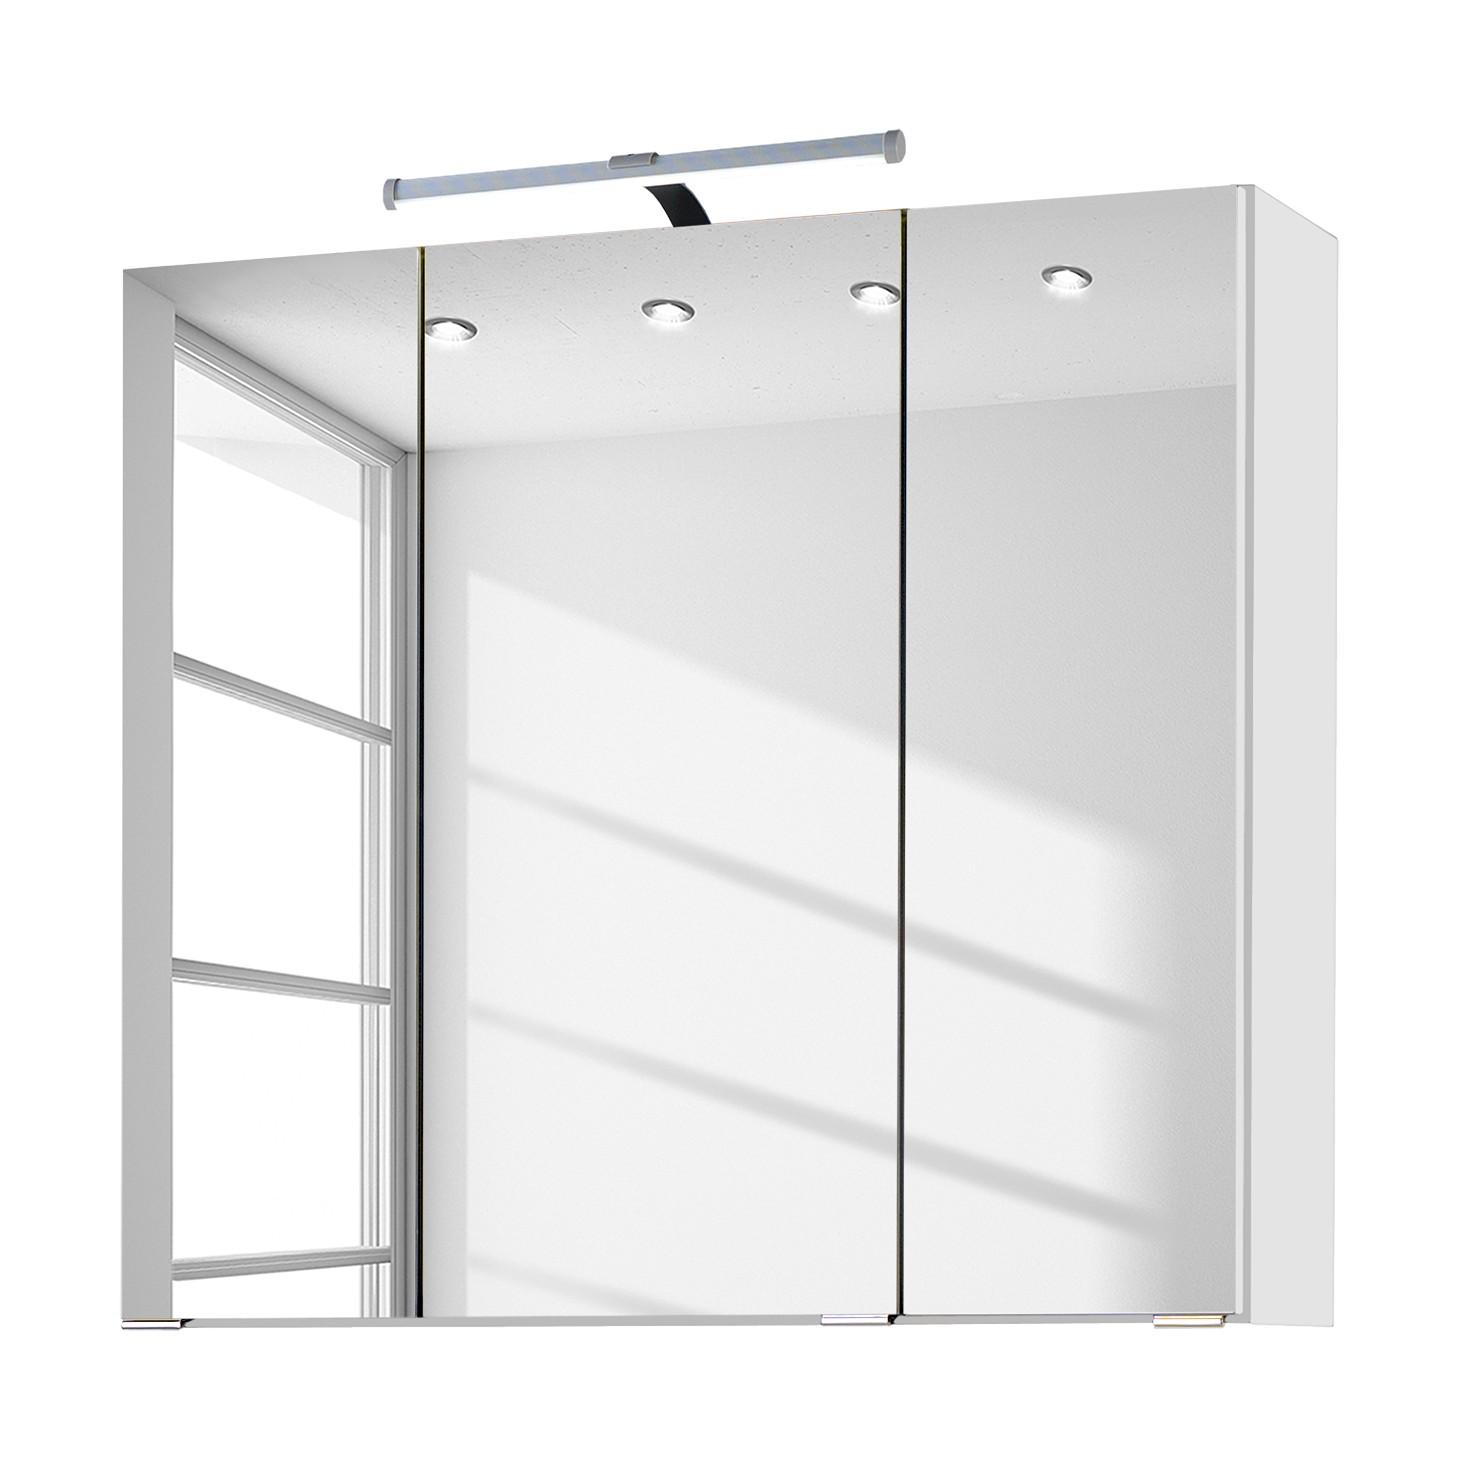 energia A+, Armadietto a specchio Zeehan - Bianco - 70 cm, Fredriks